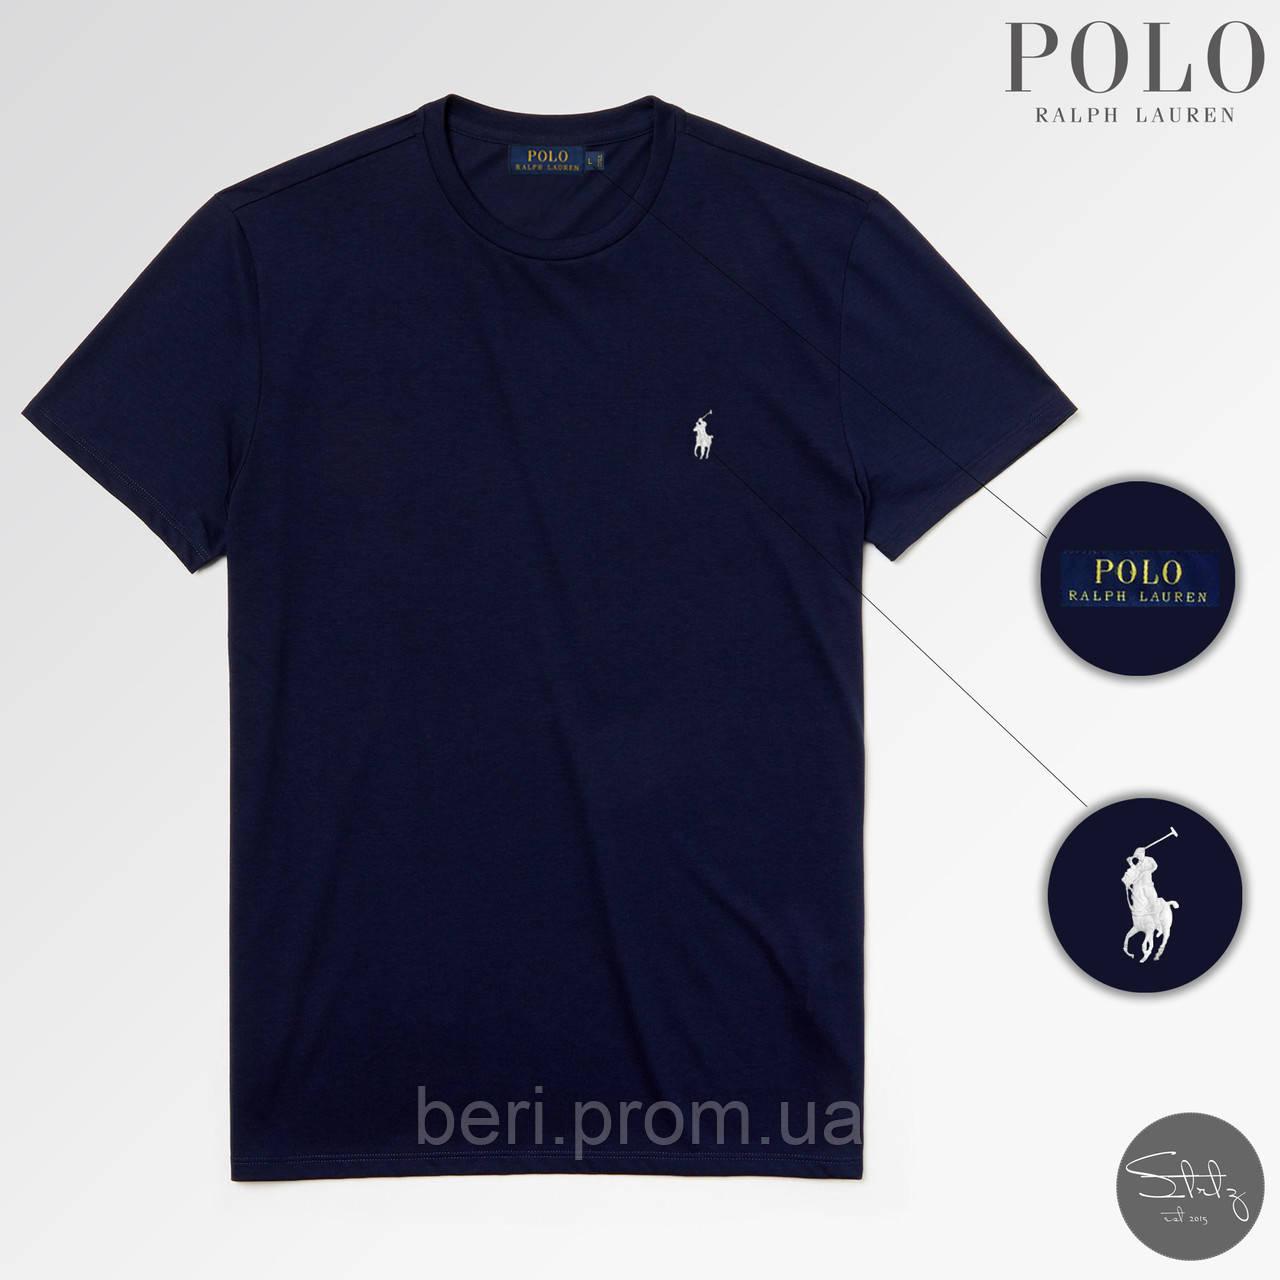 Мужская классическая футболка Polo Ralph Lauren | Чоловіча класична футболка Поло Ральф Лорен (Темно-Синий)